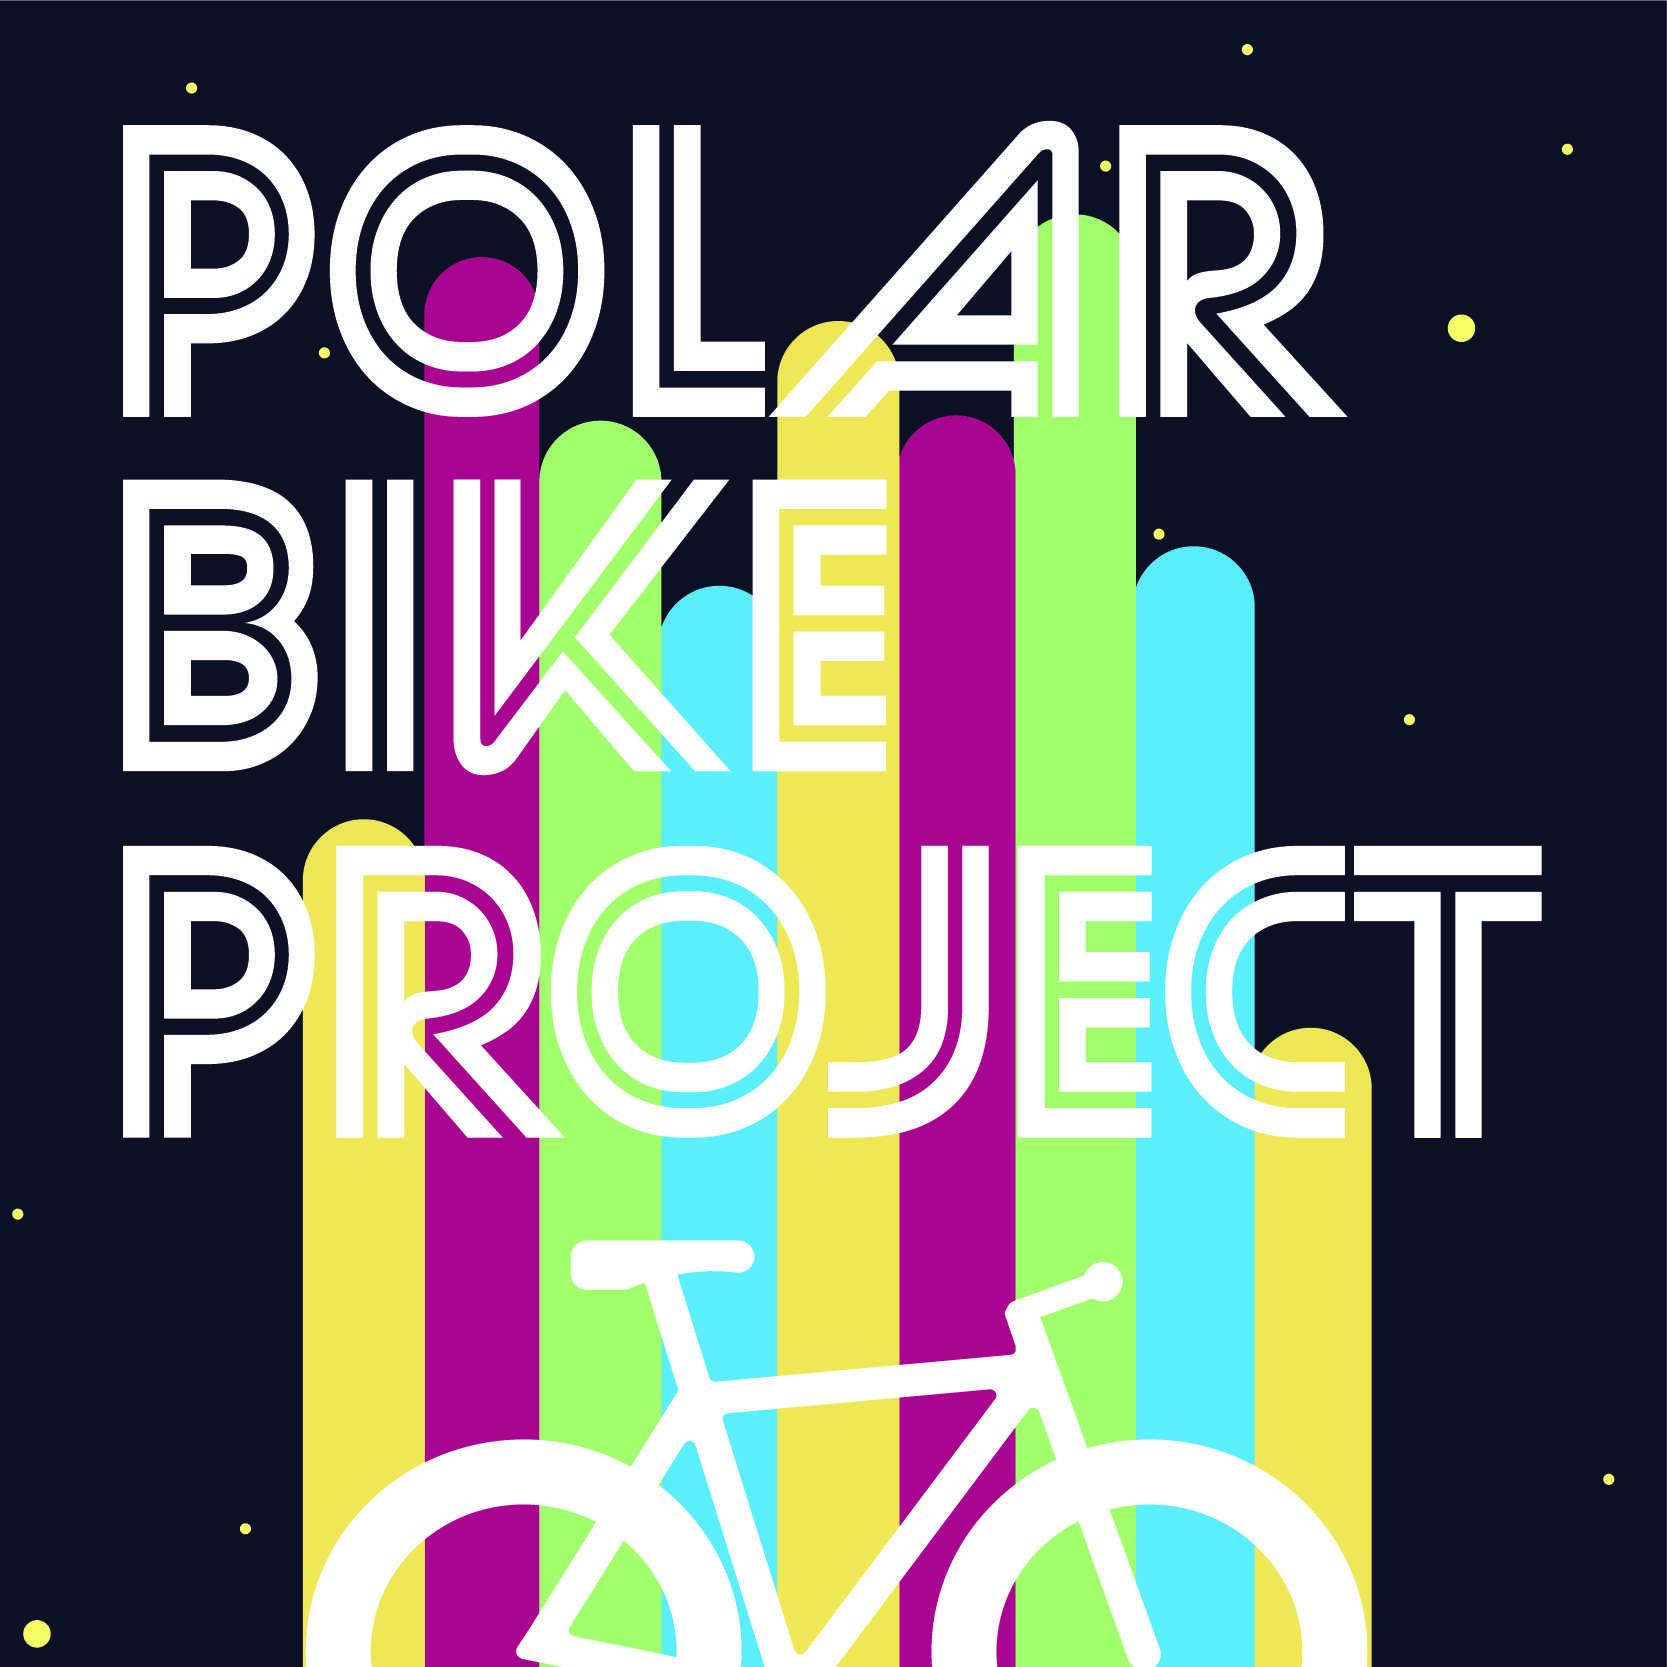 Polar Bike Project